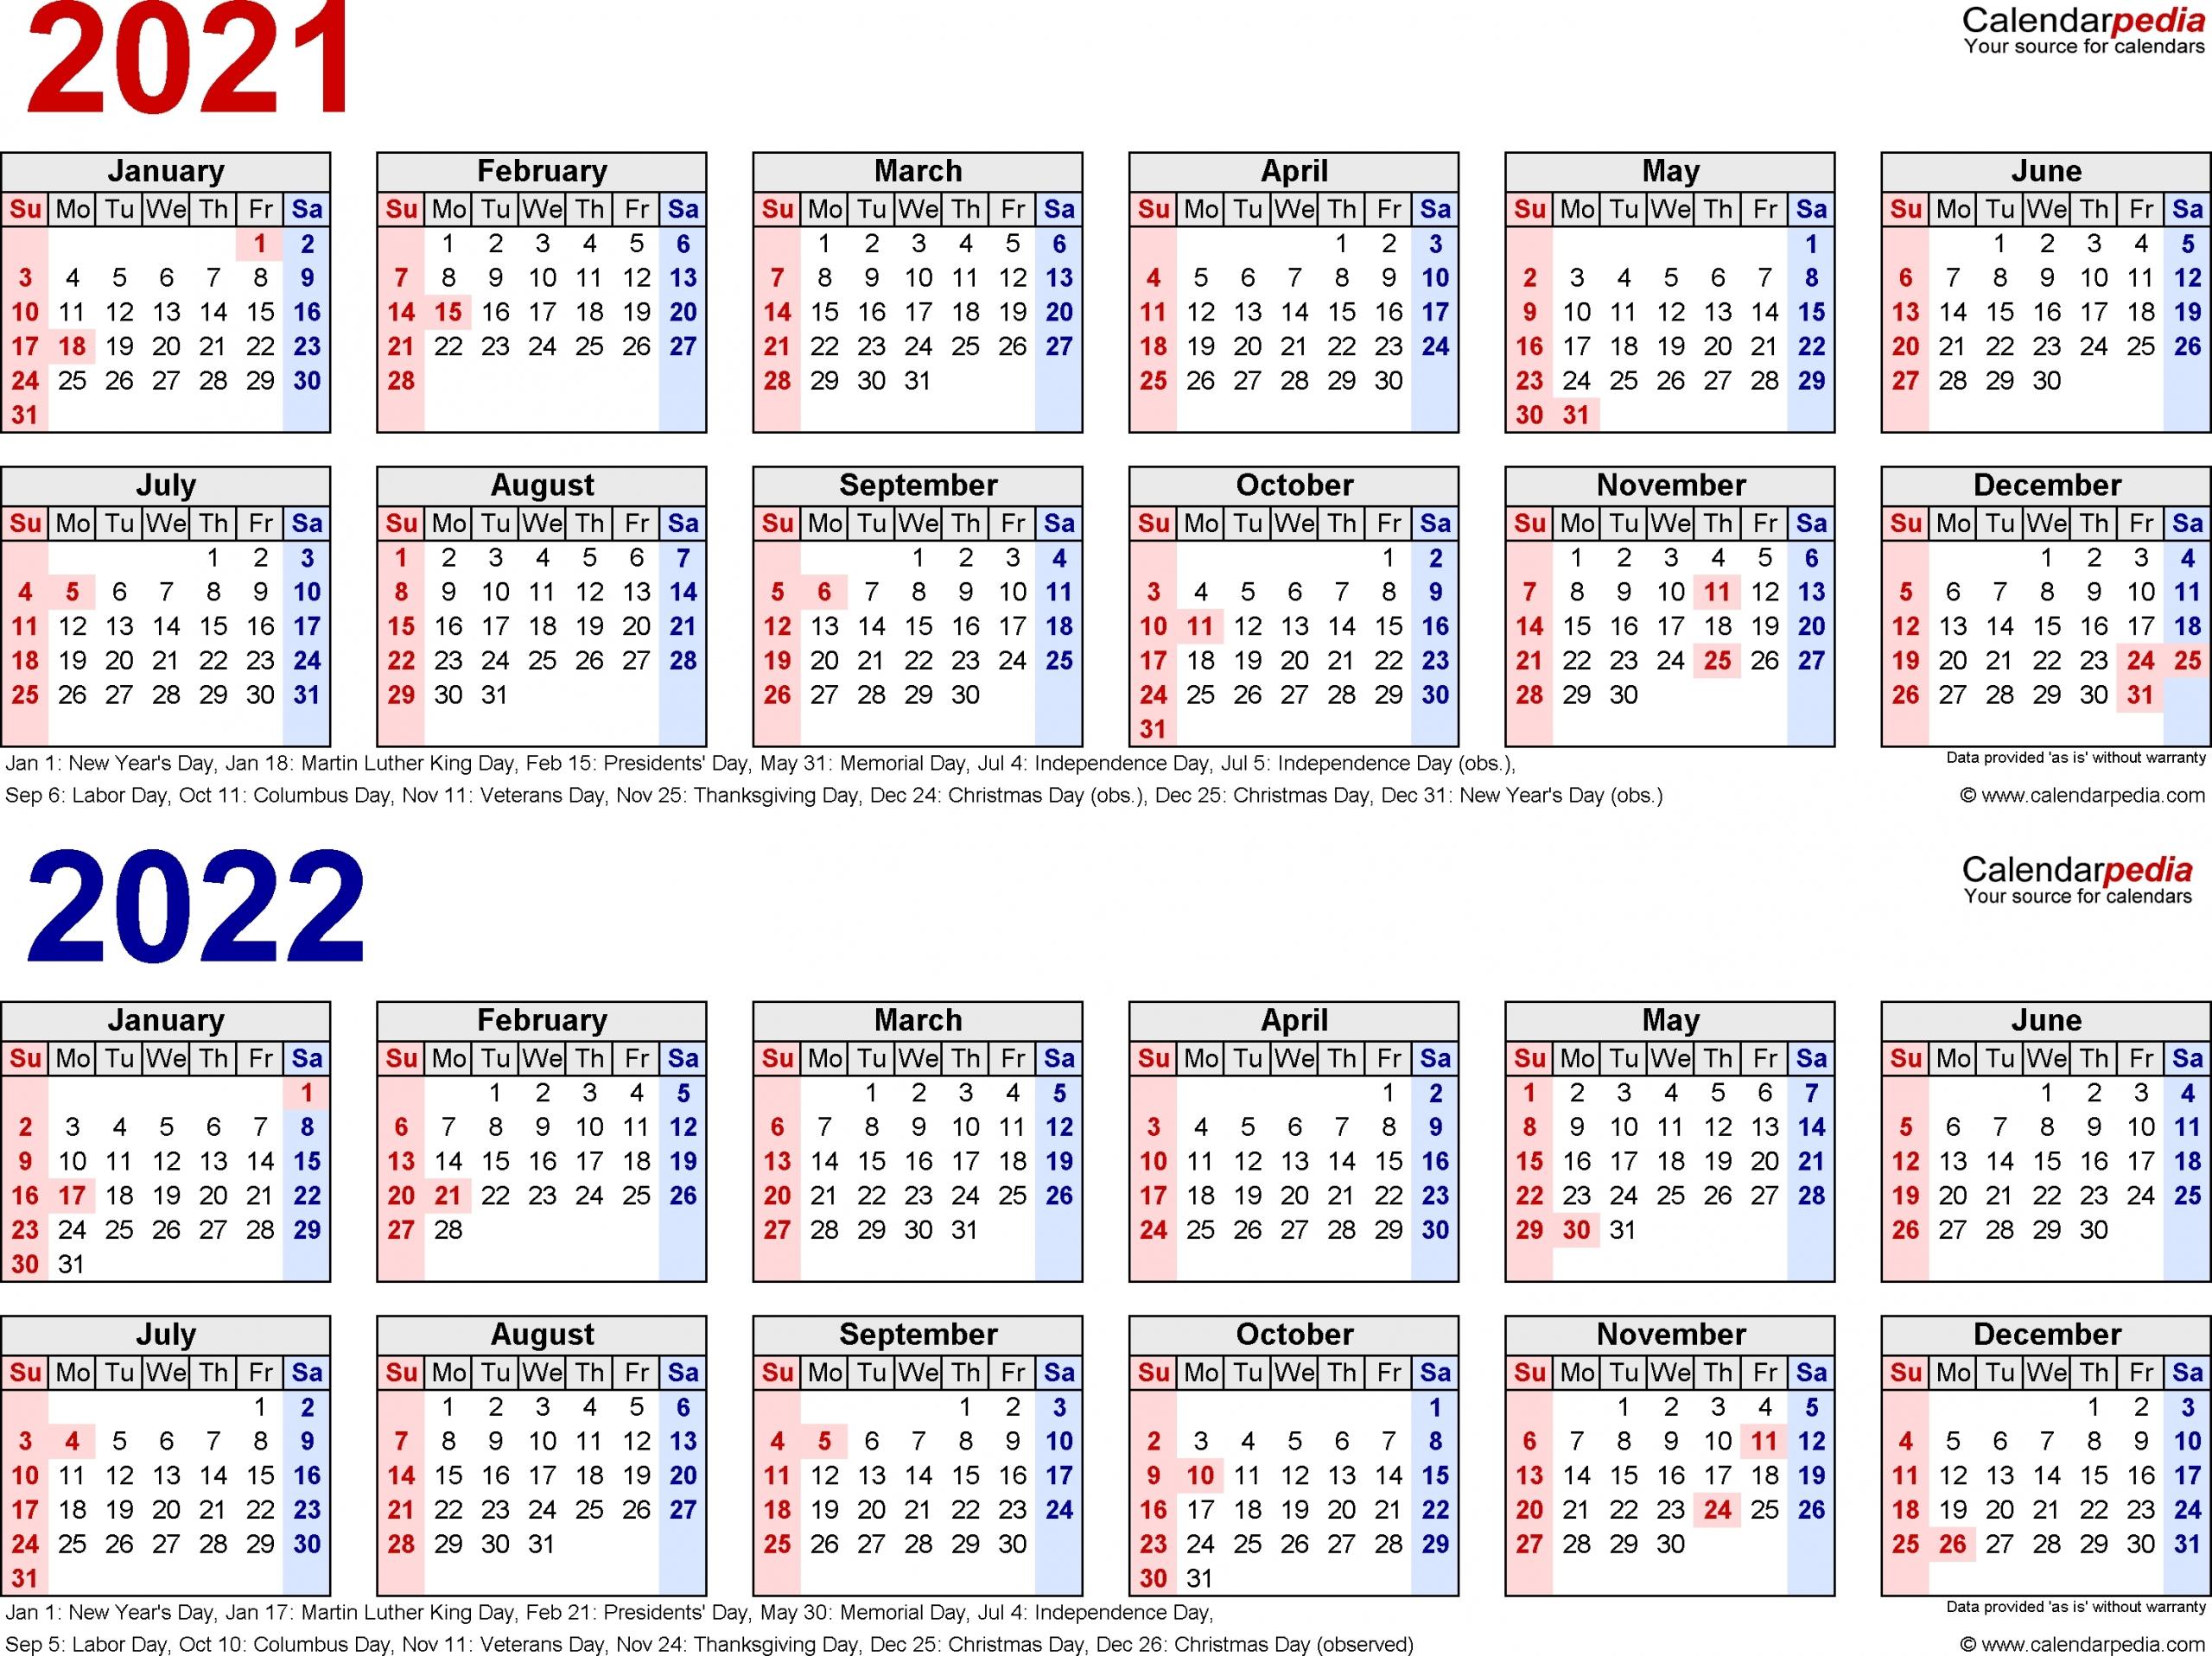 3 Year Calendars 2021 2022 2023 Free Printable   Calendar